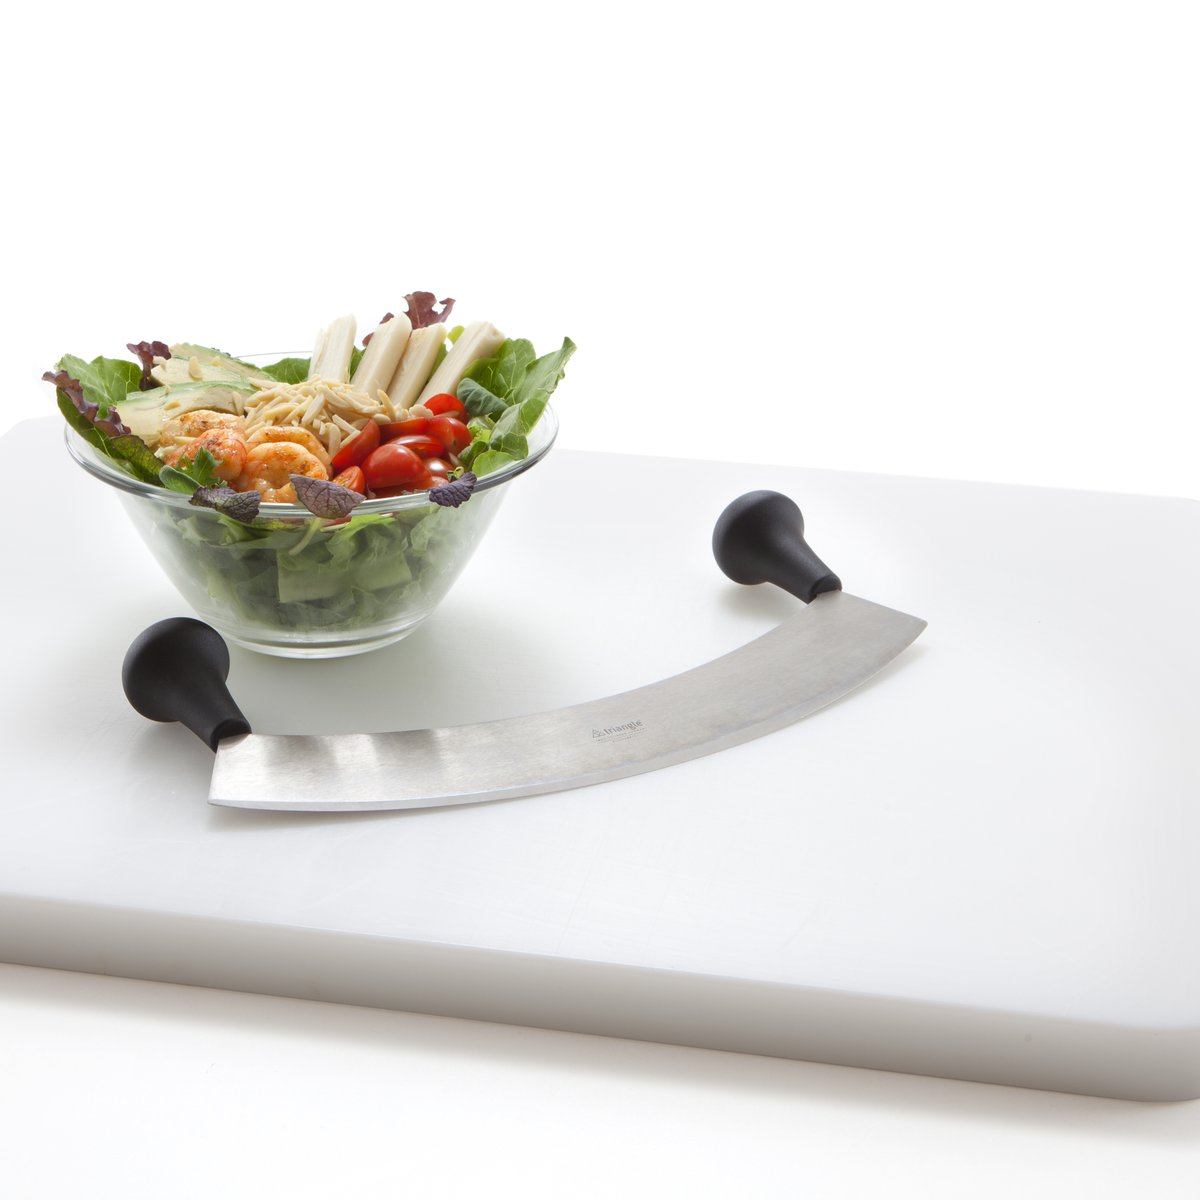 Salat vor Schnitt